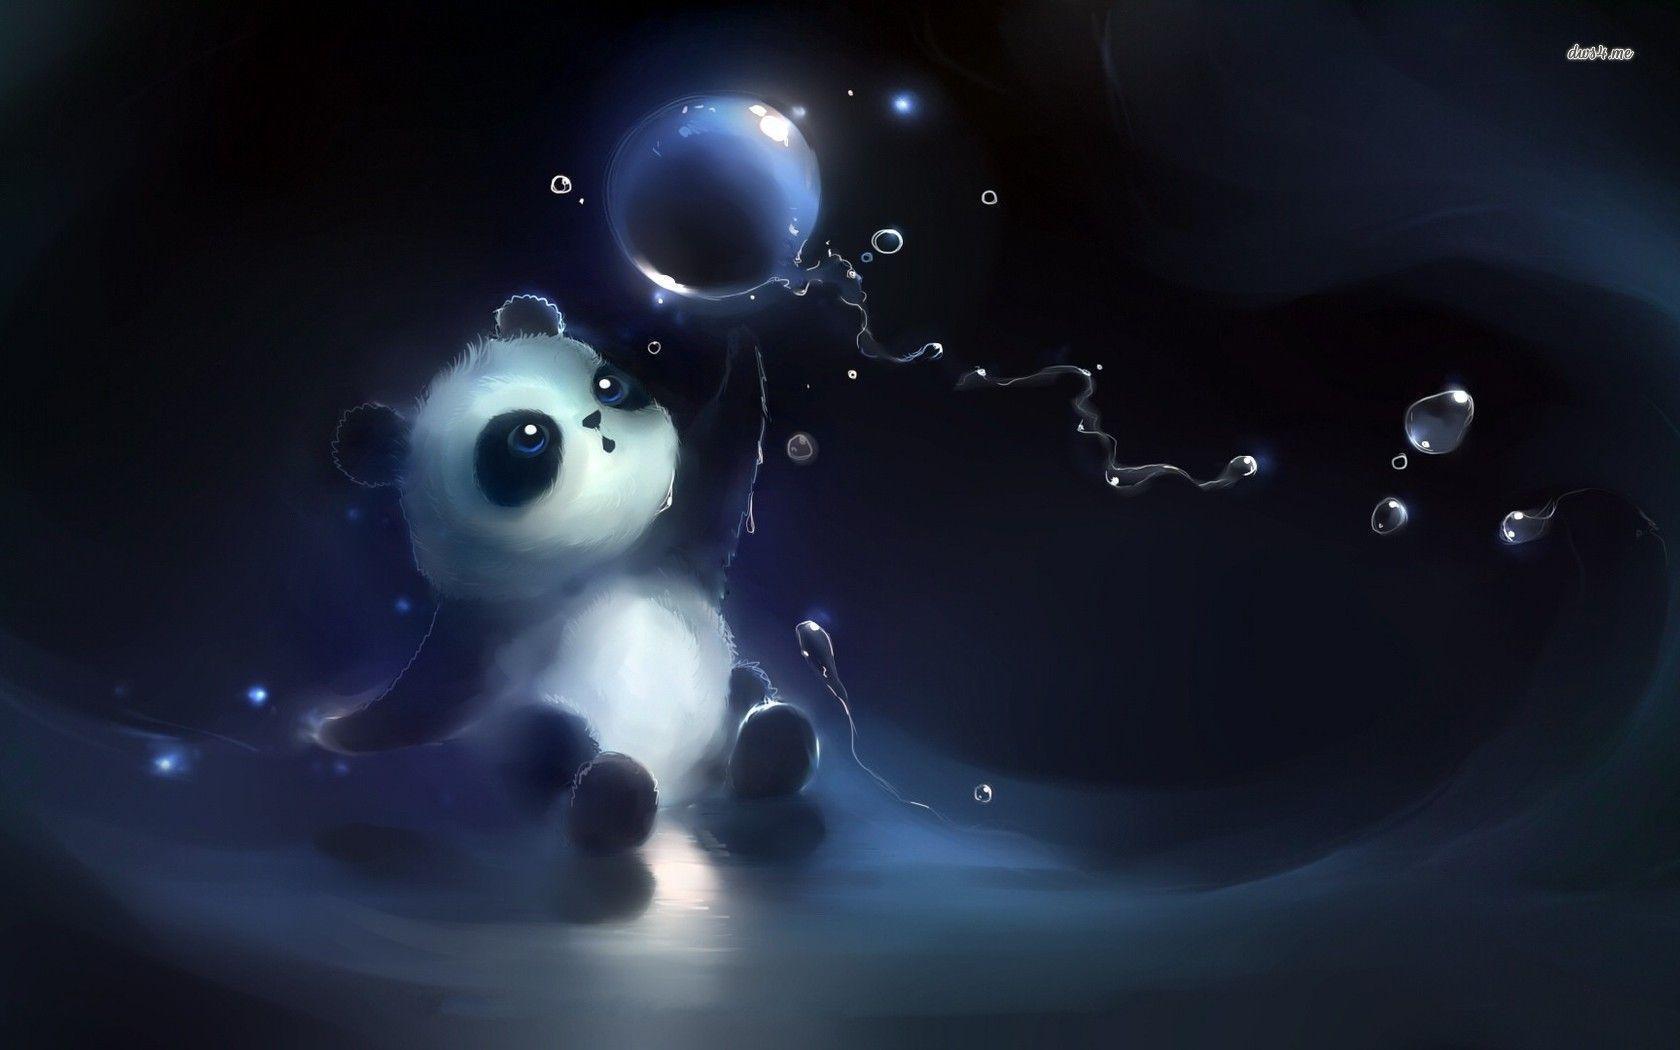 Baby Panda Wallpapers 1680x1050